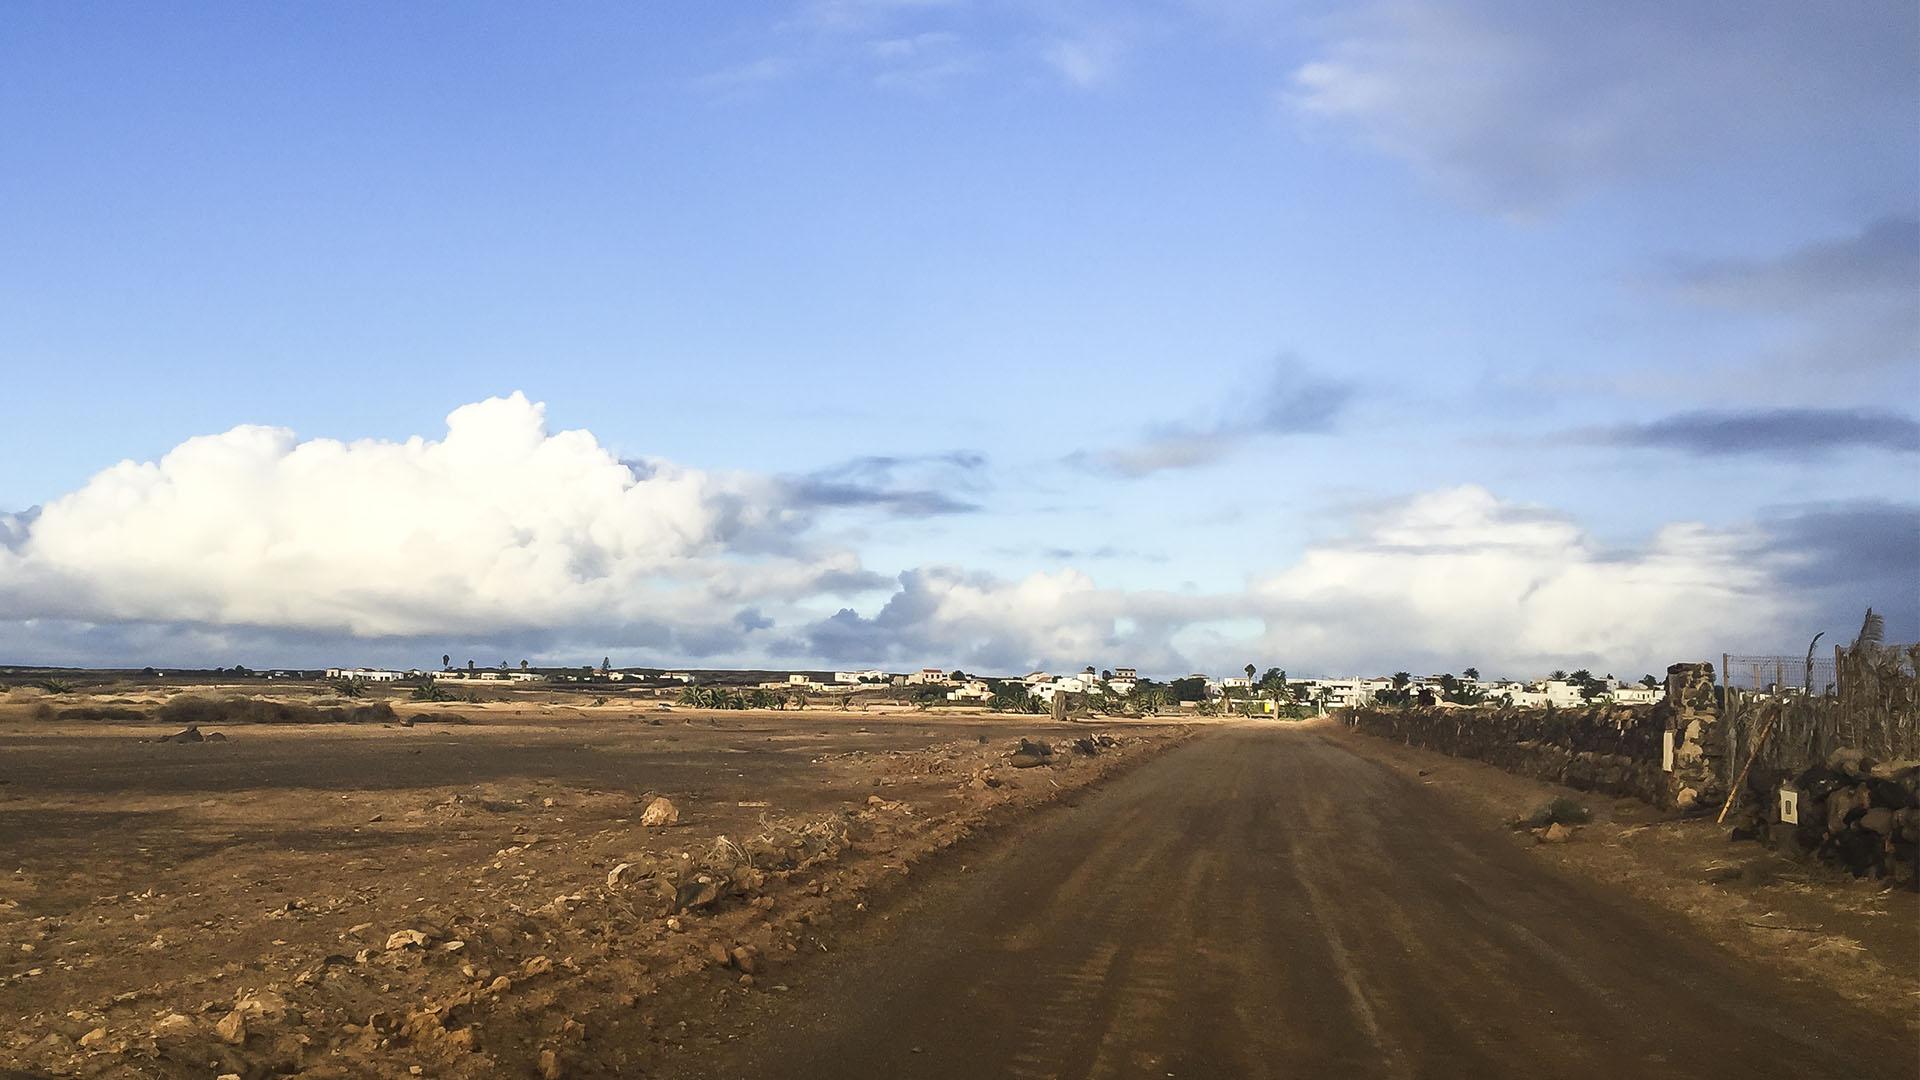 El Roque, Fuerteventura, Canary Islands, www.sunnyfuerte.com